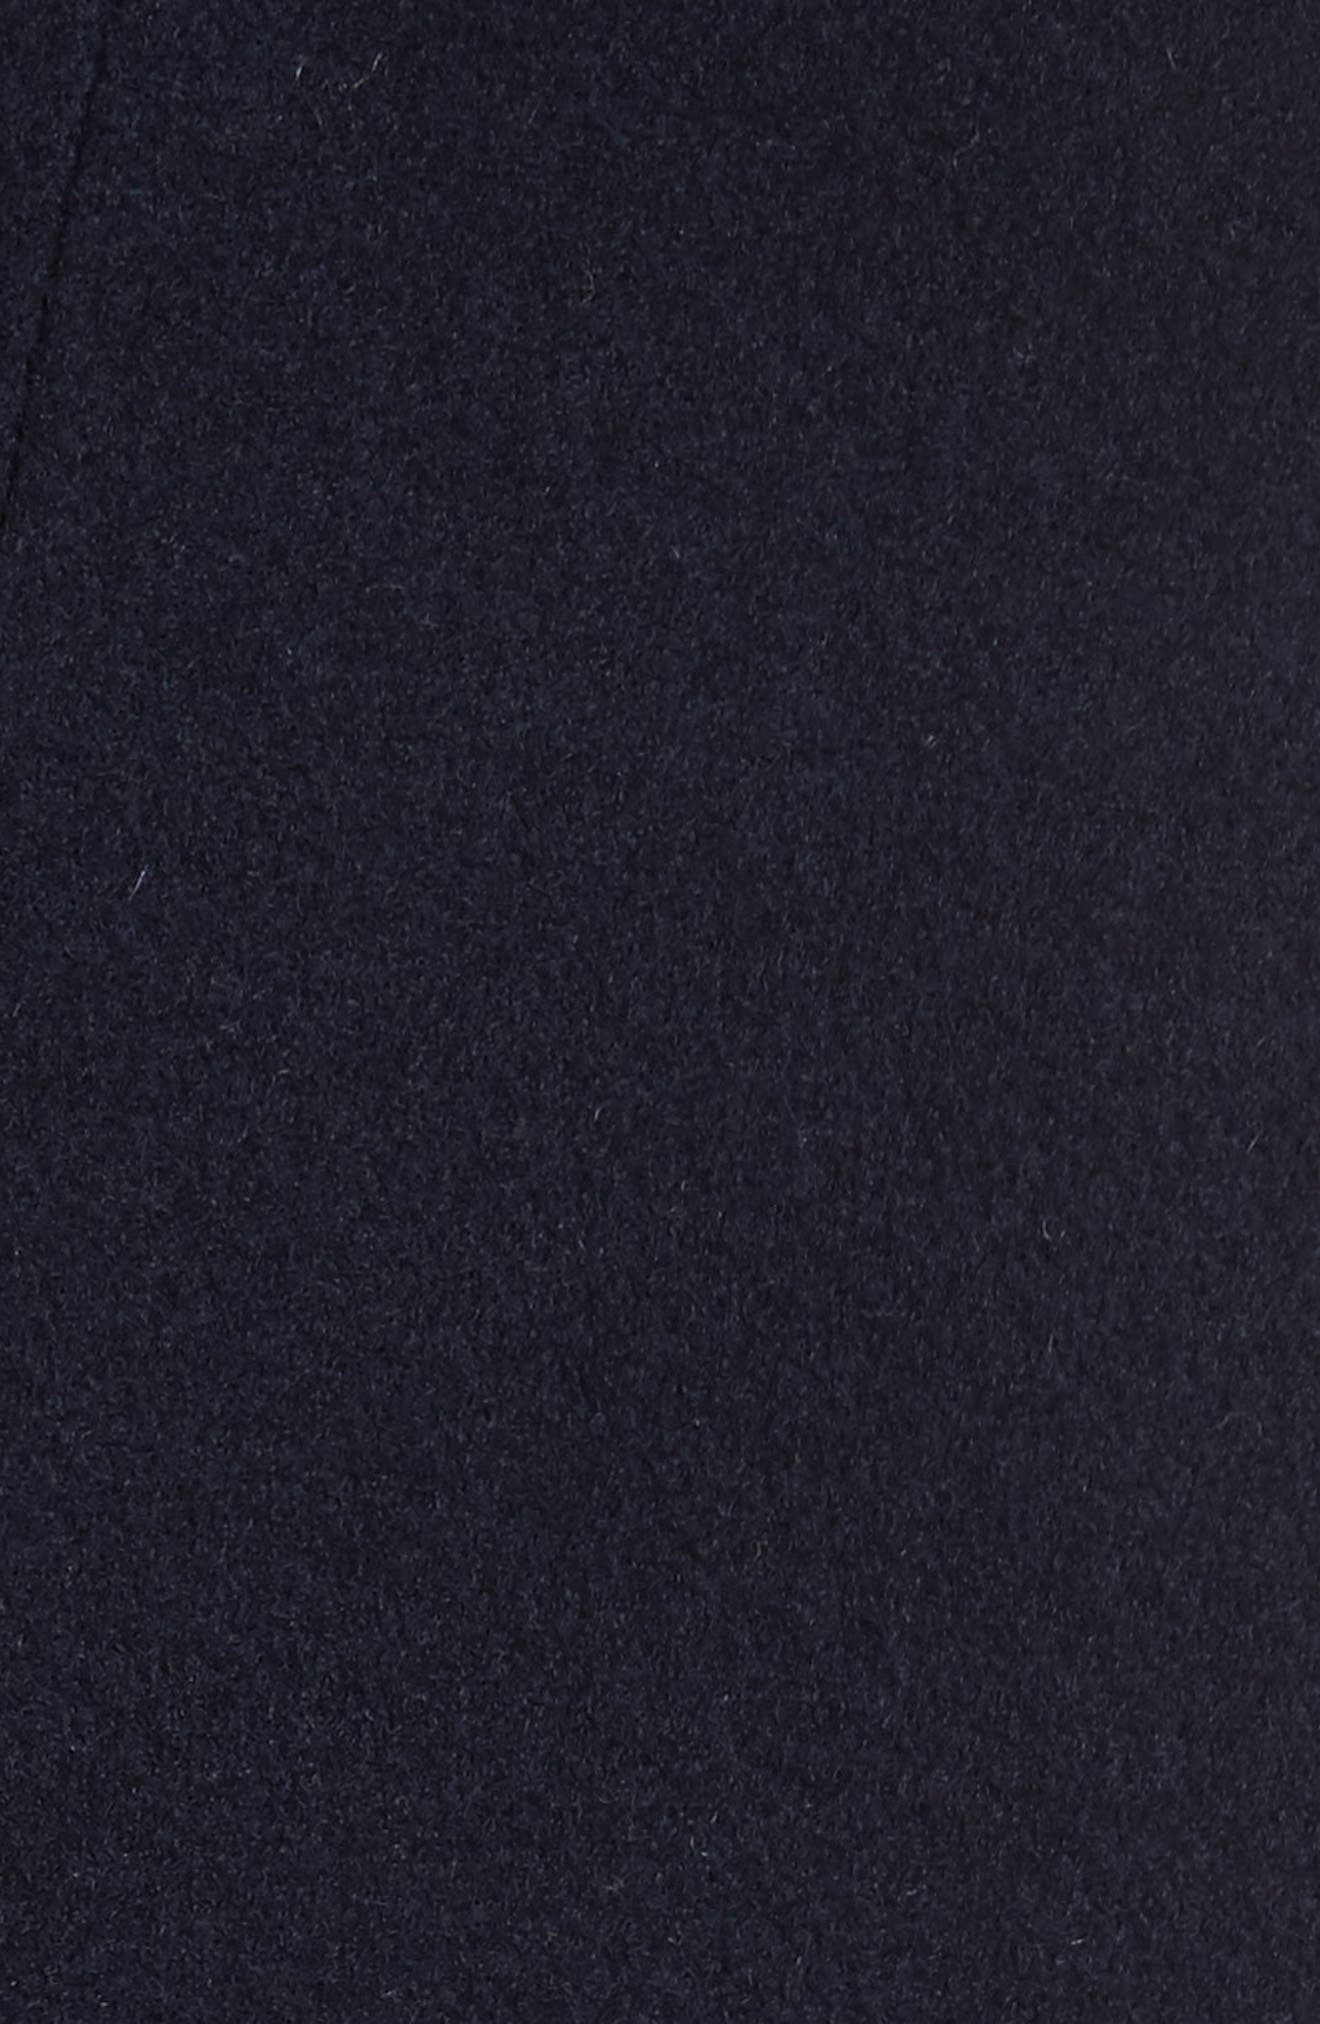 Wool Car Coat,                             Alternate thumbnail 6, color,                             004